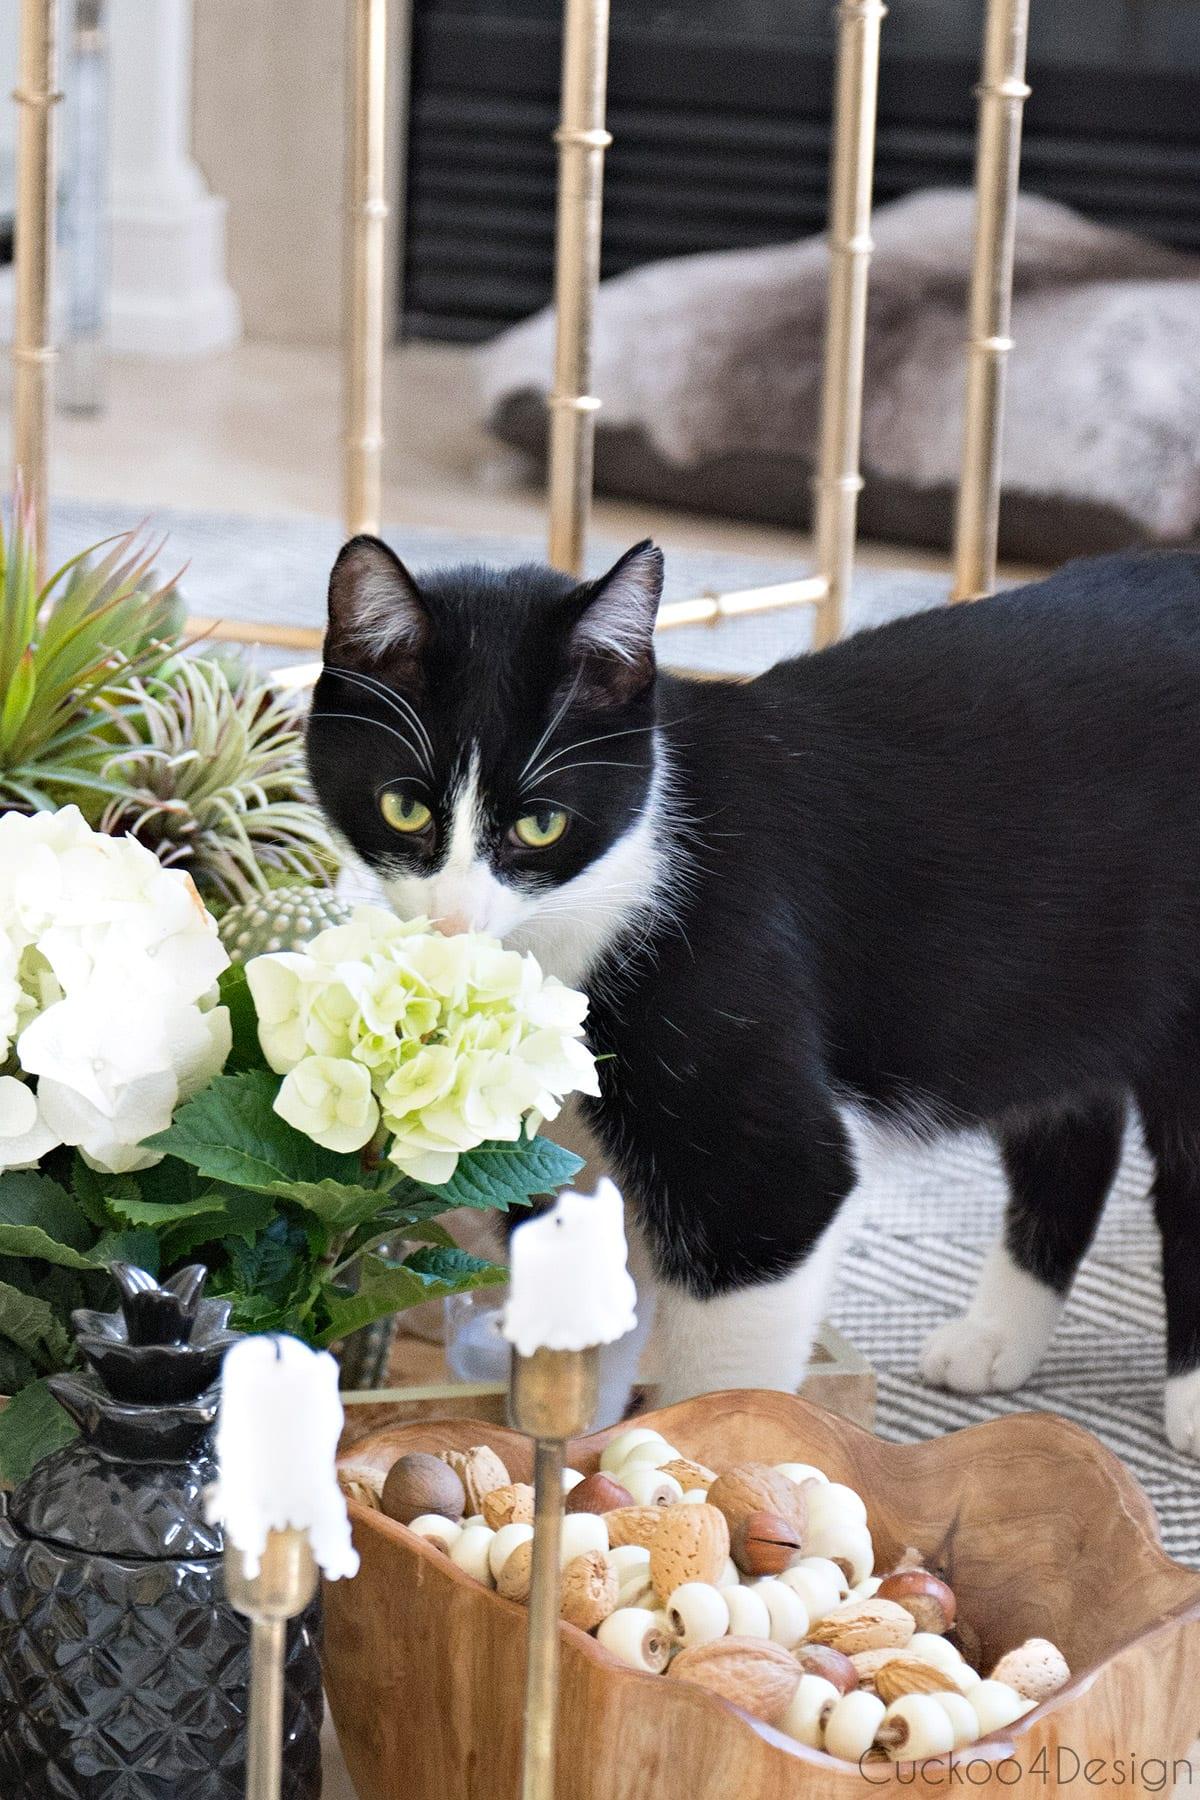 tuxedo cat smelling flowers